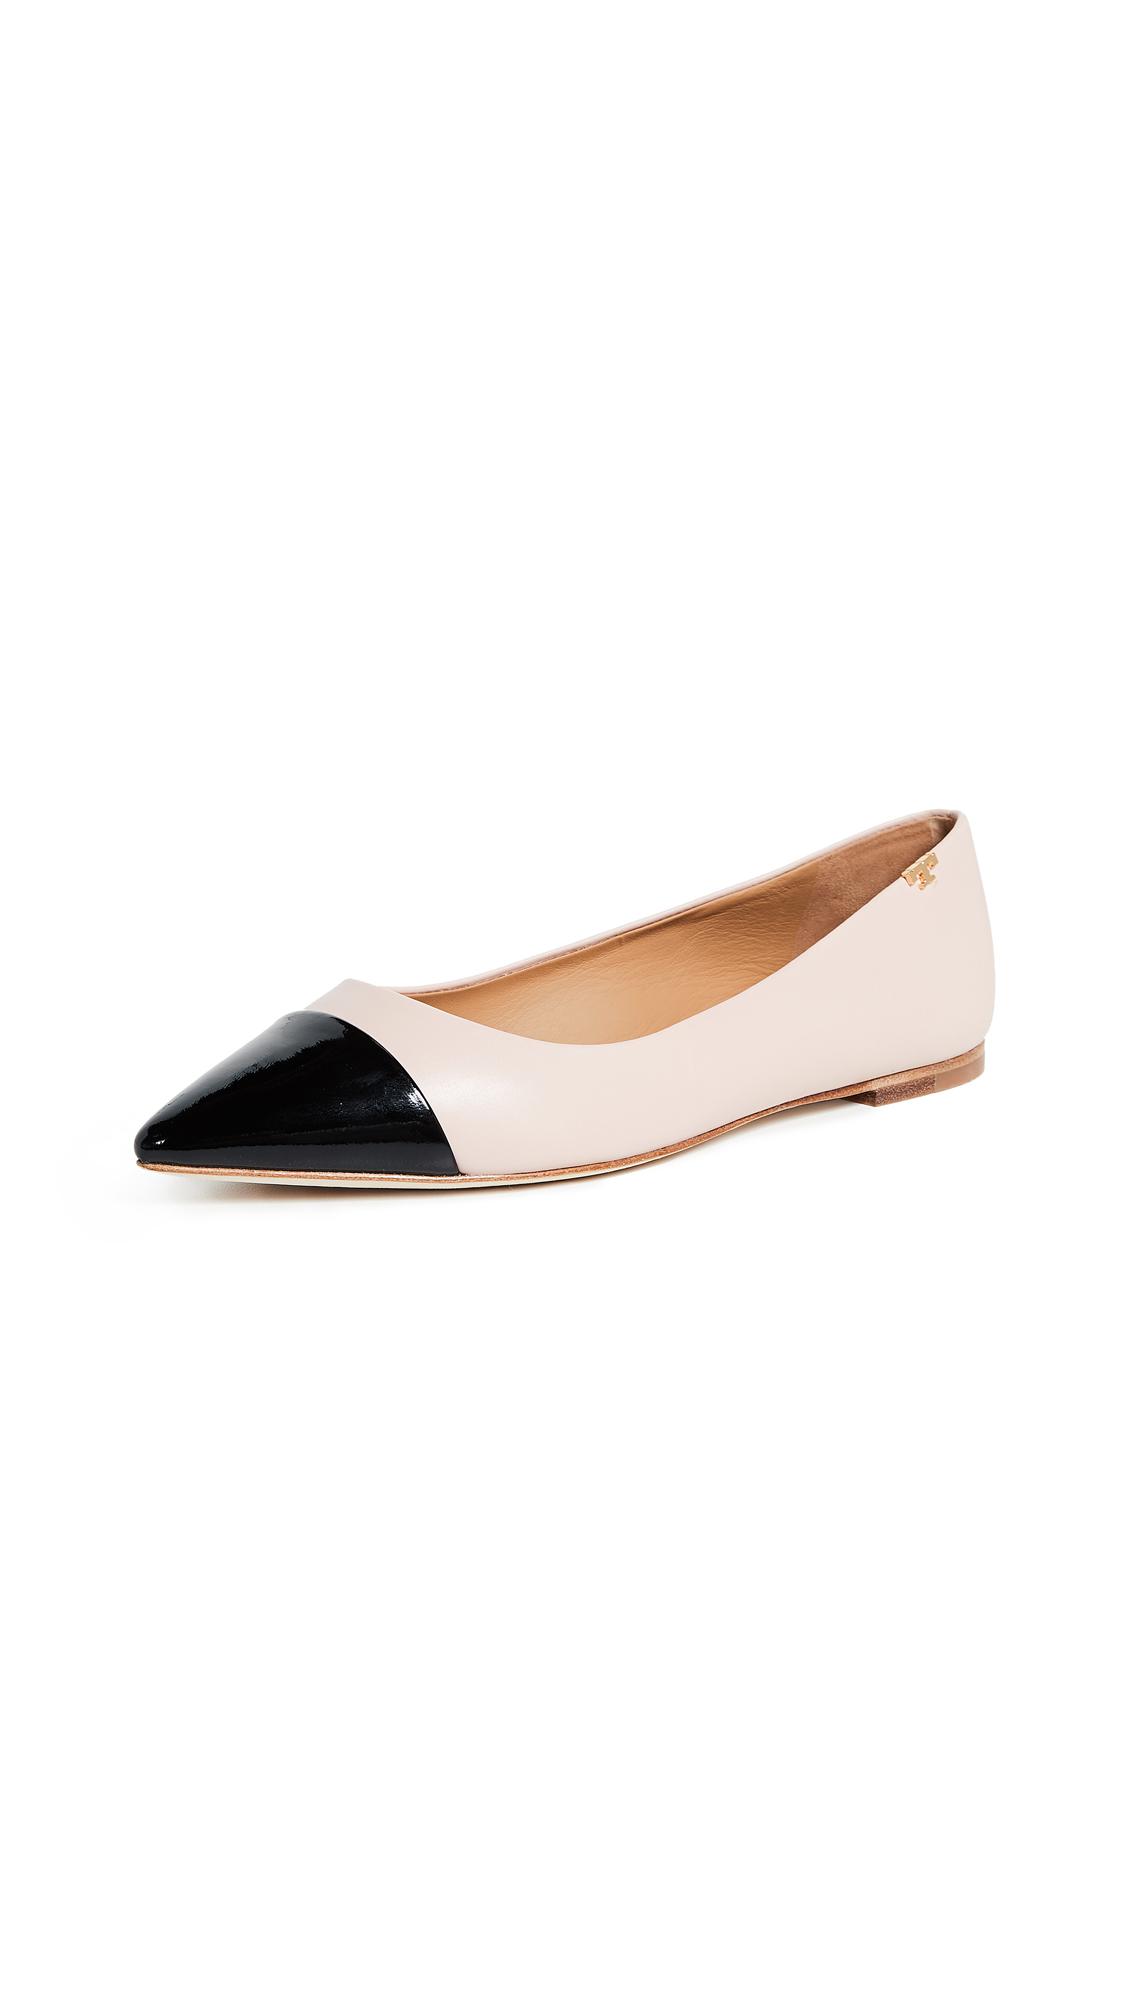 Tory Burch Penelope Cap Toe Flats - Sea Shell Pink/Perfect Black